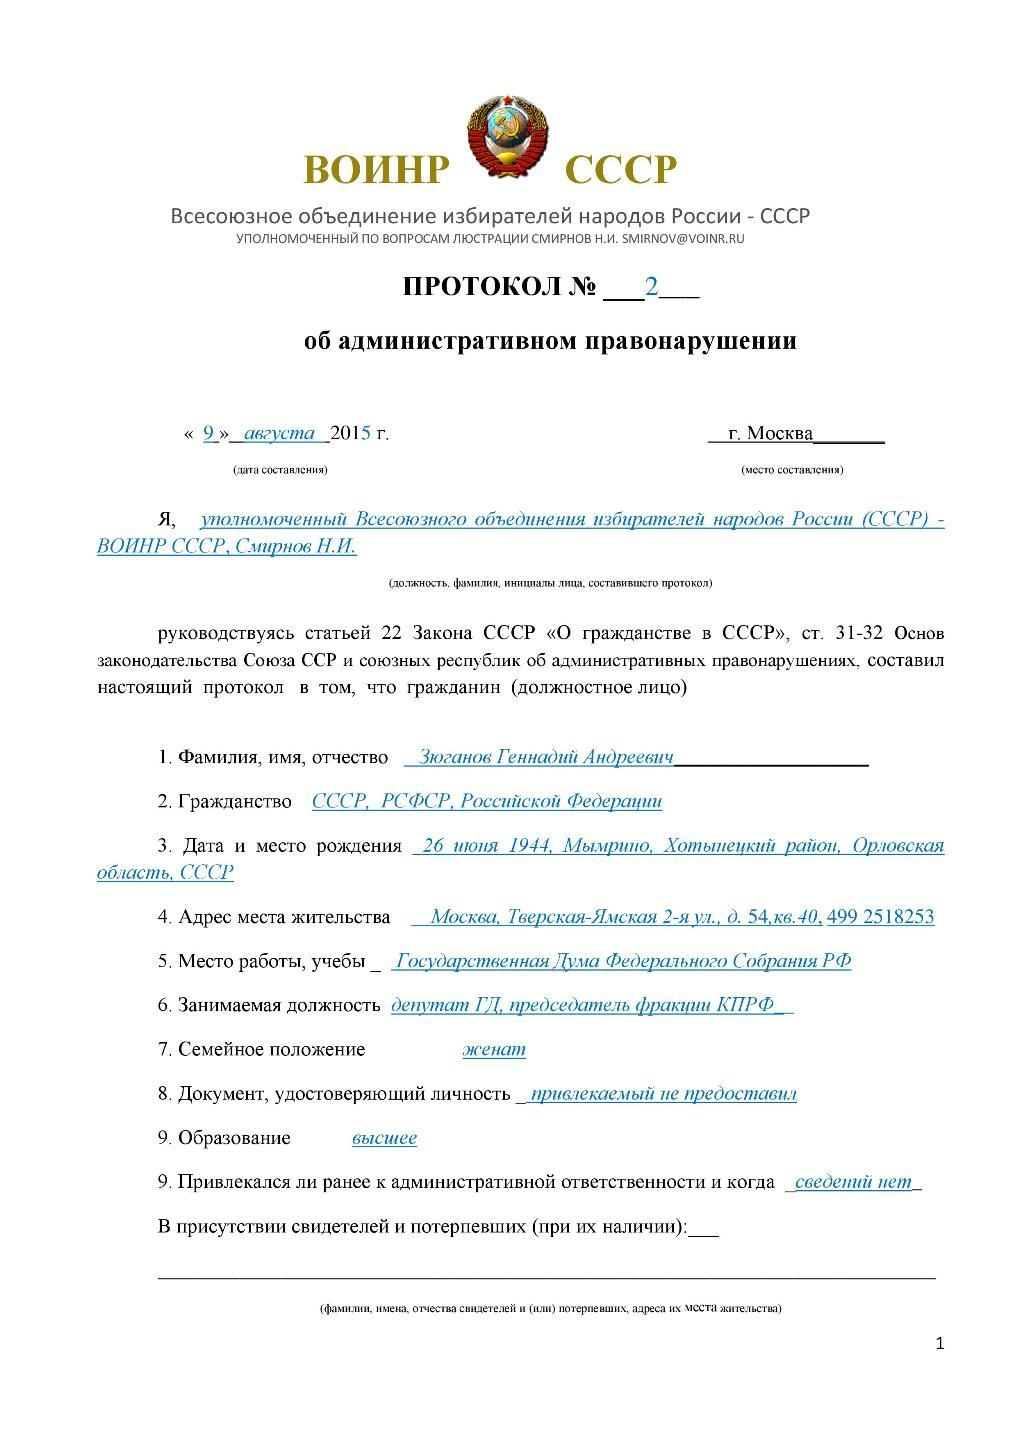 http://narsud-sssr.ru/wp-content/uploads/2015/08/page1.jpg